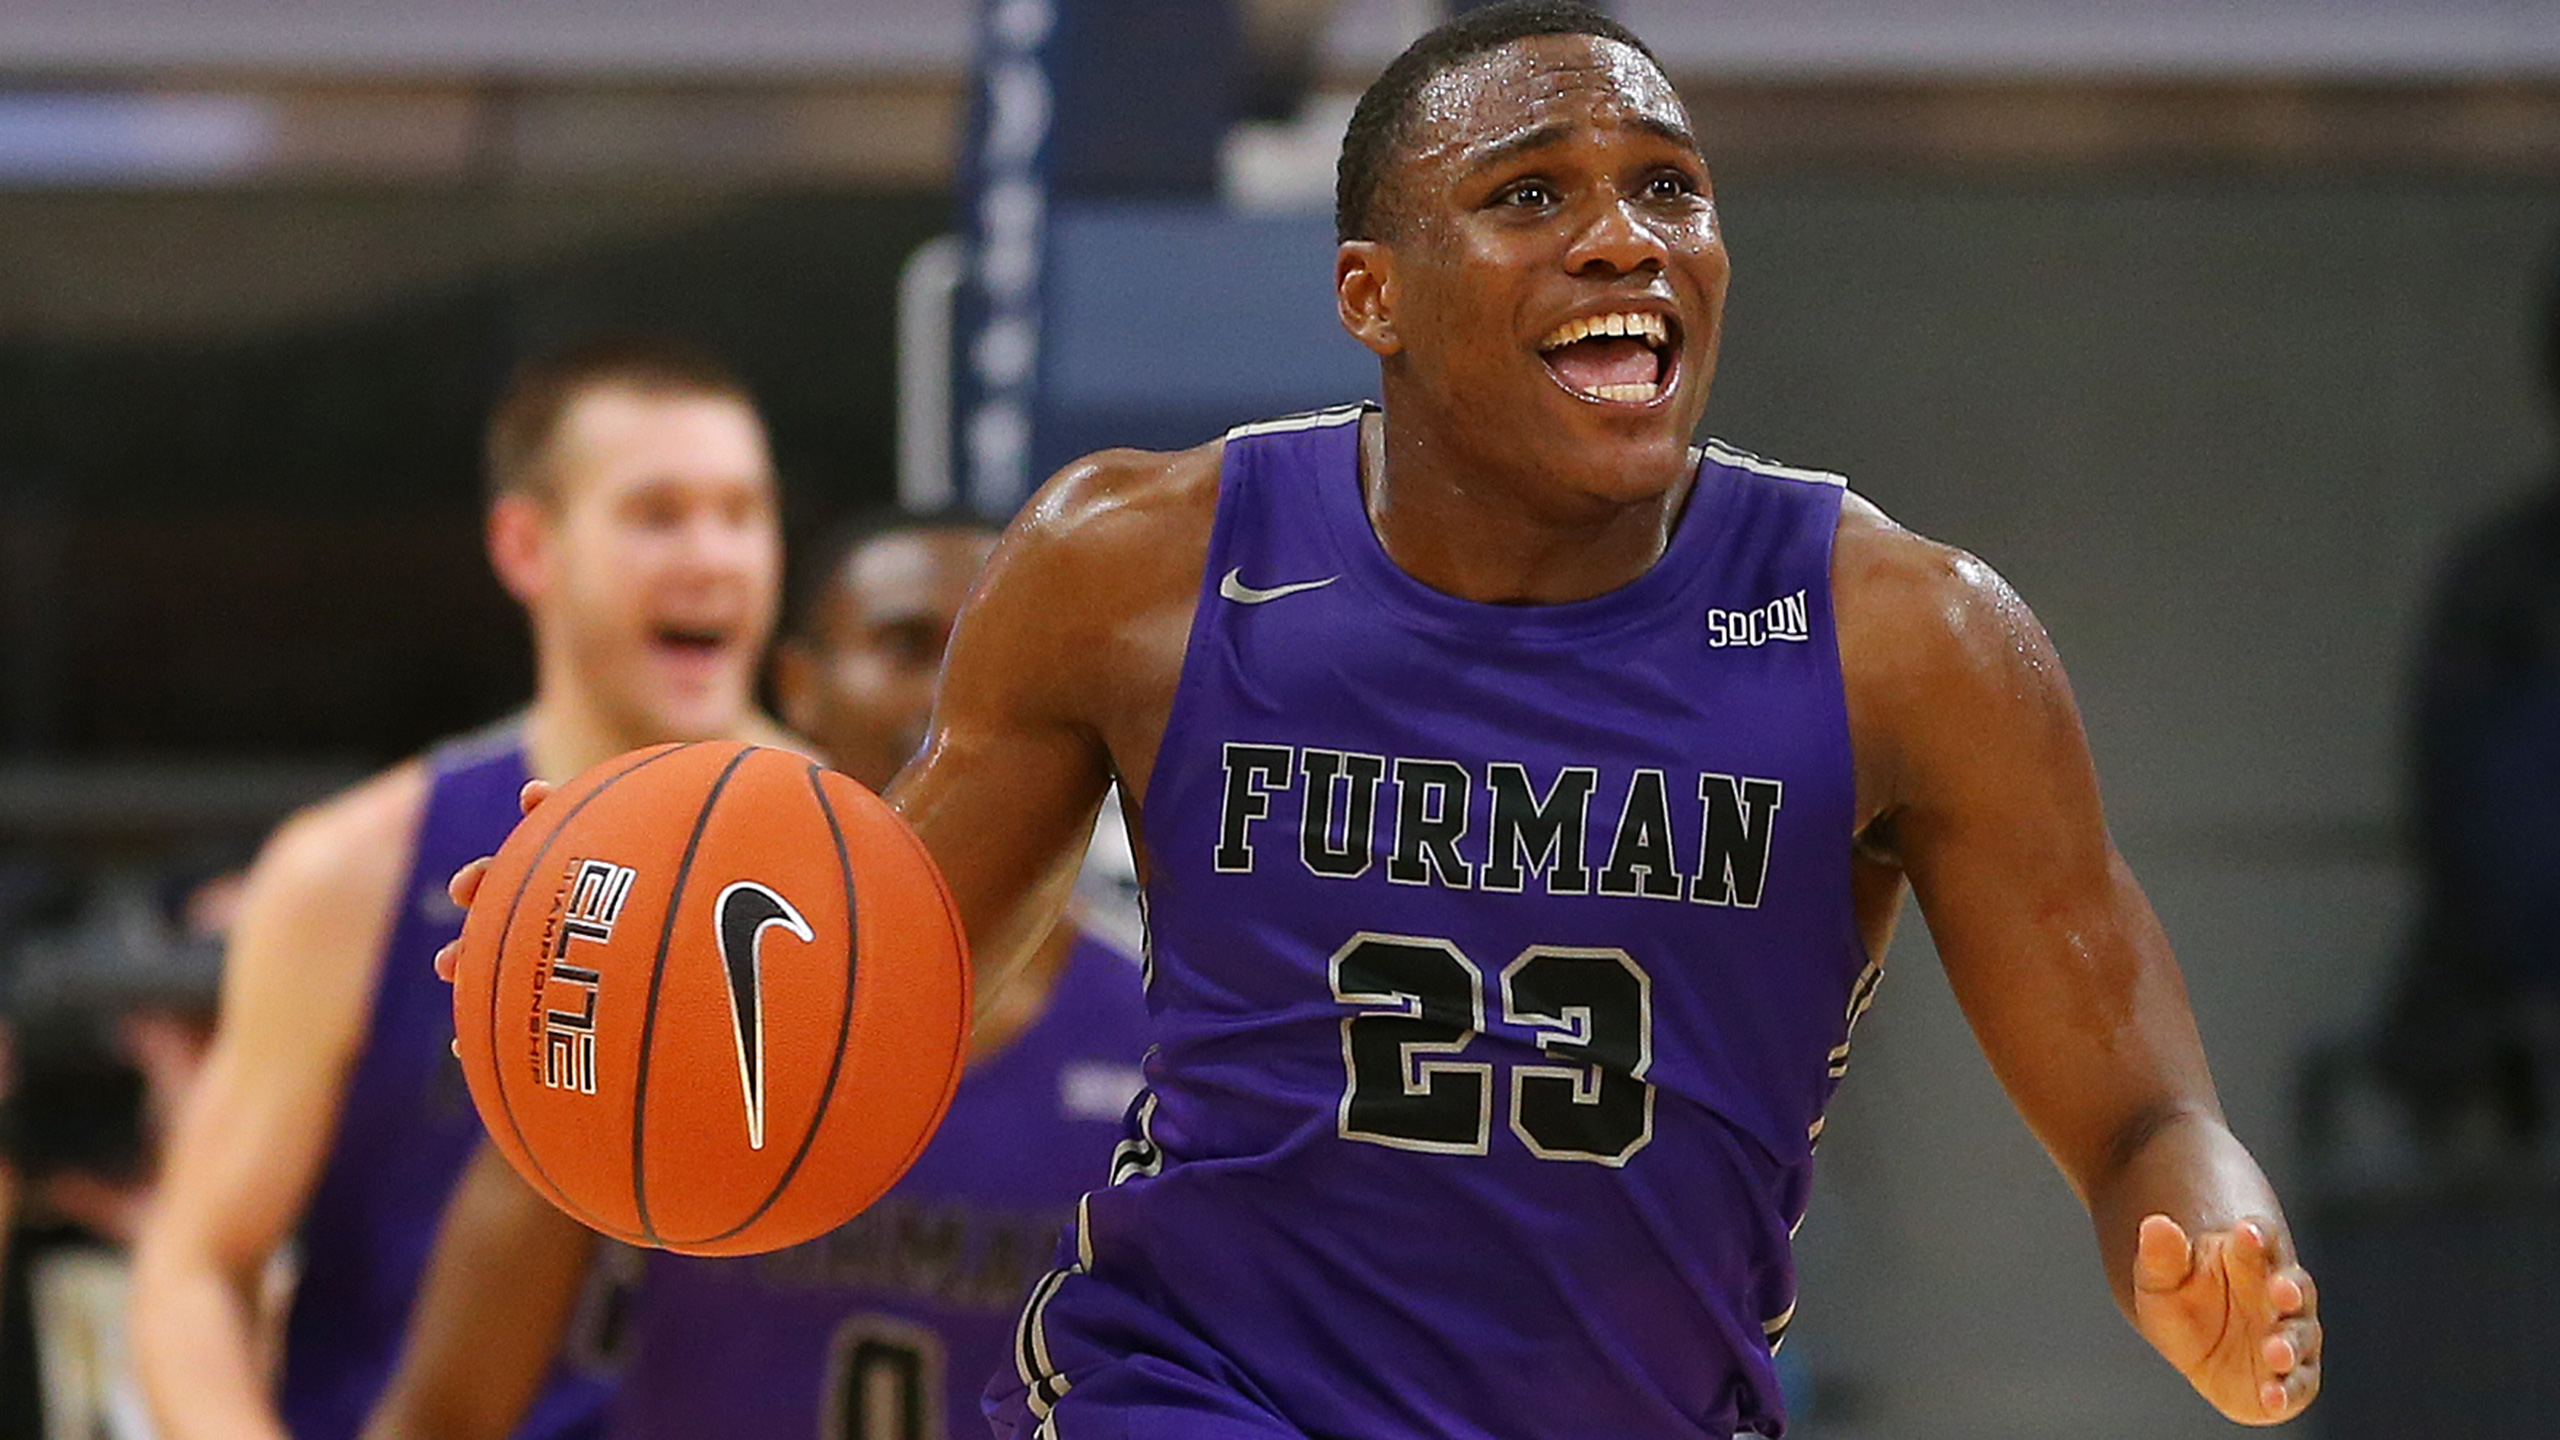 #24 Furman vs. LSU (M Basketball)